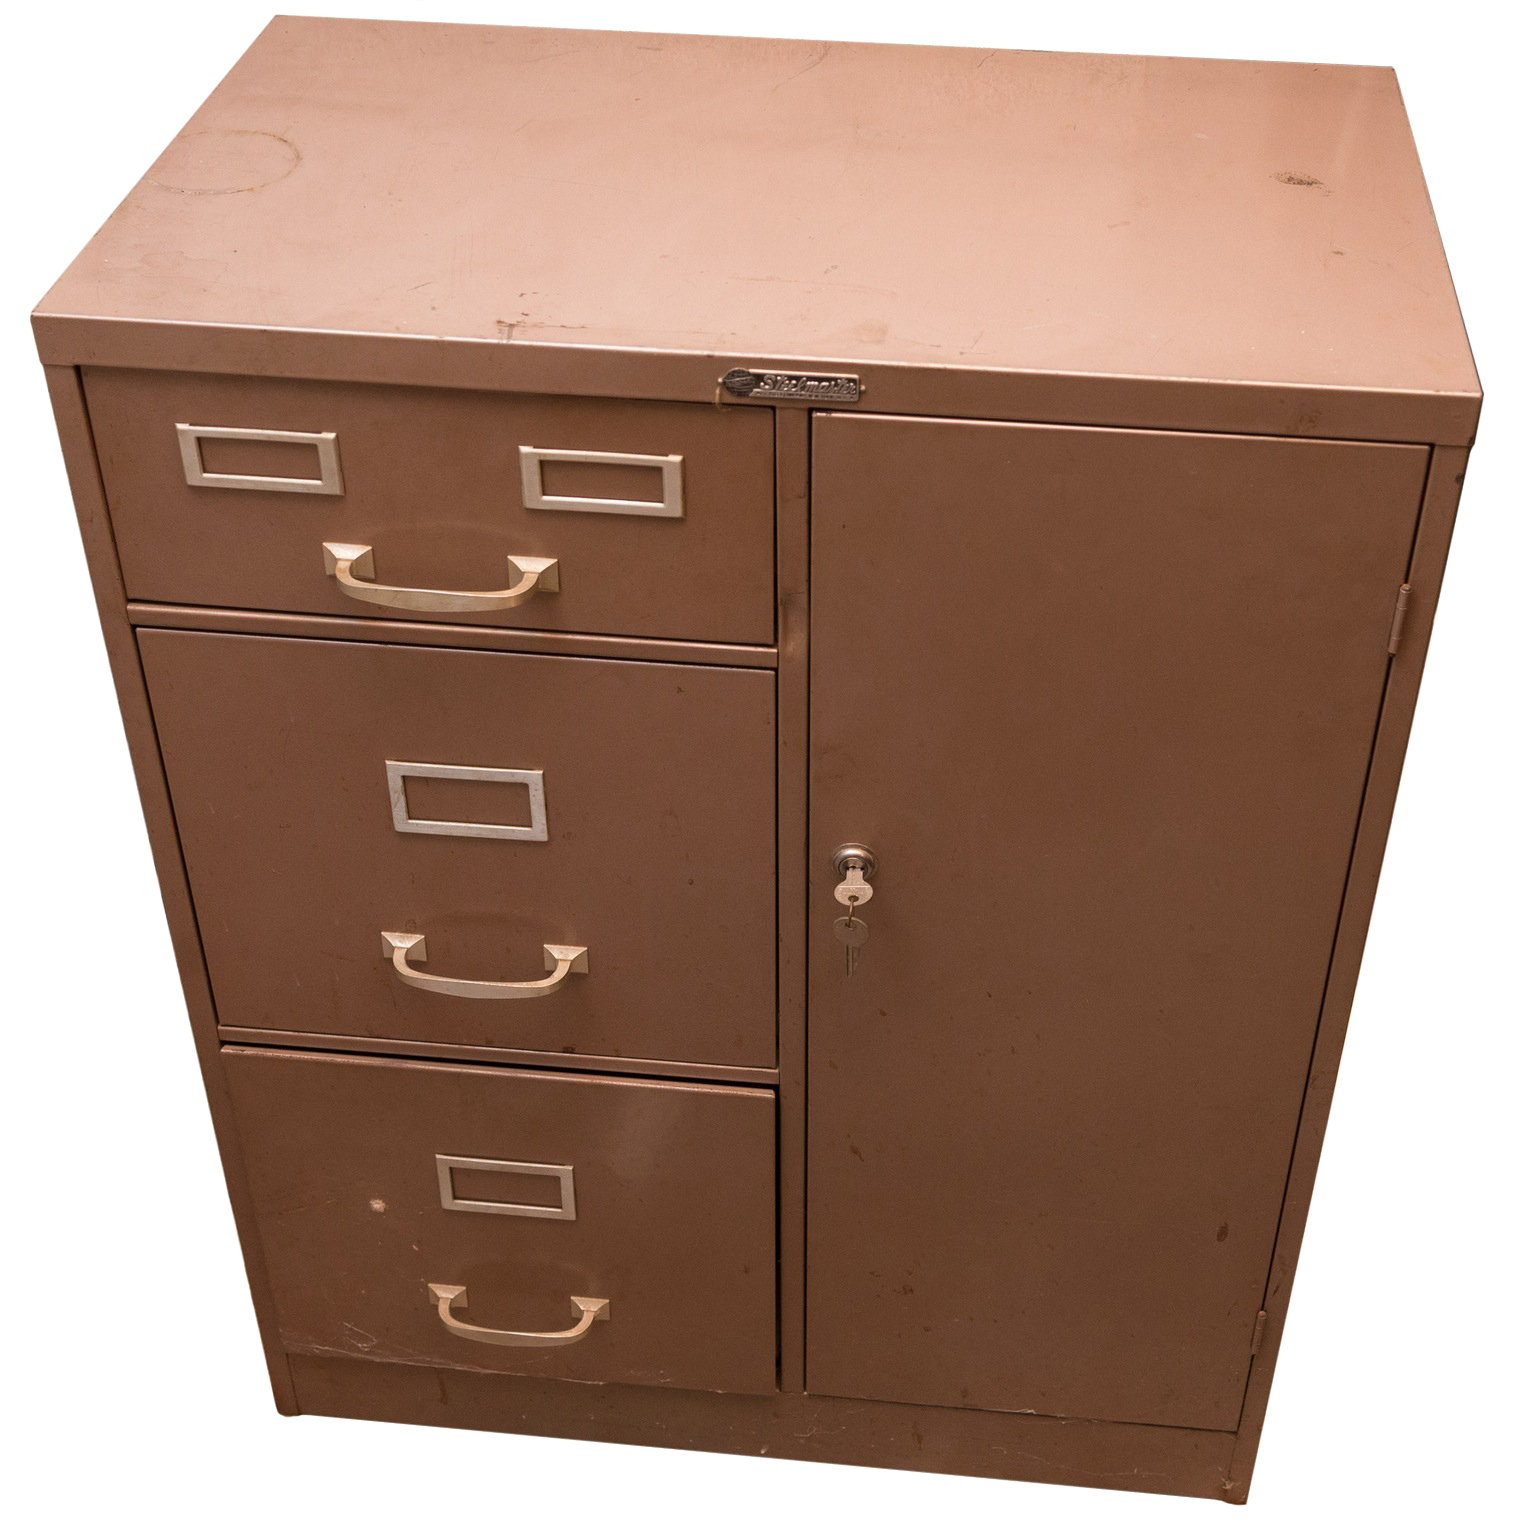 Vintage Steelmaster Metal Office Cabinet With Safe : EBTH